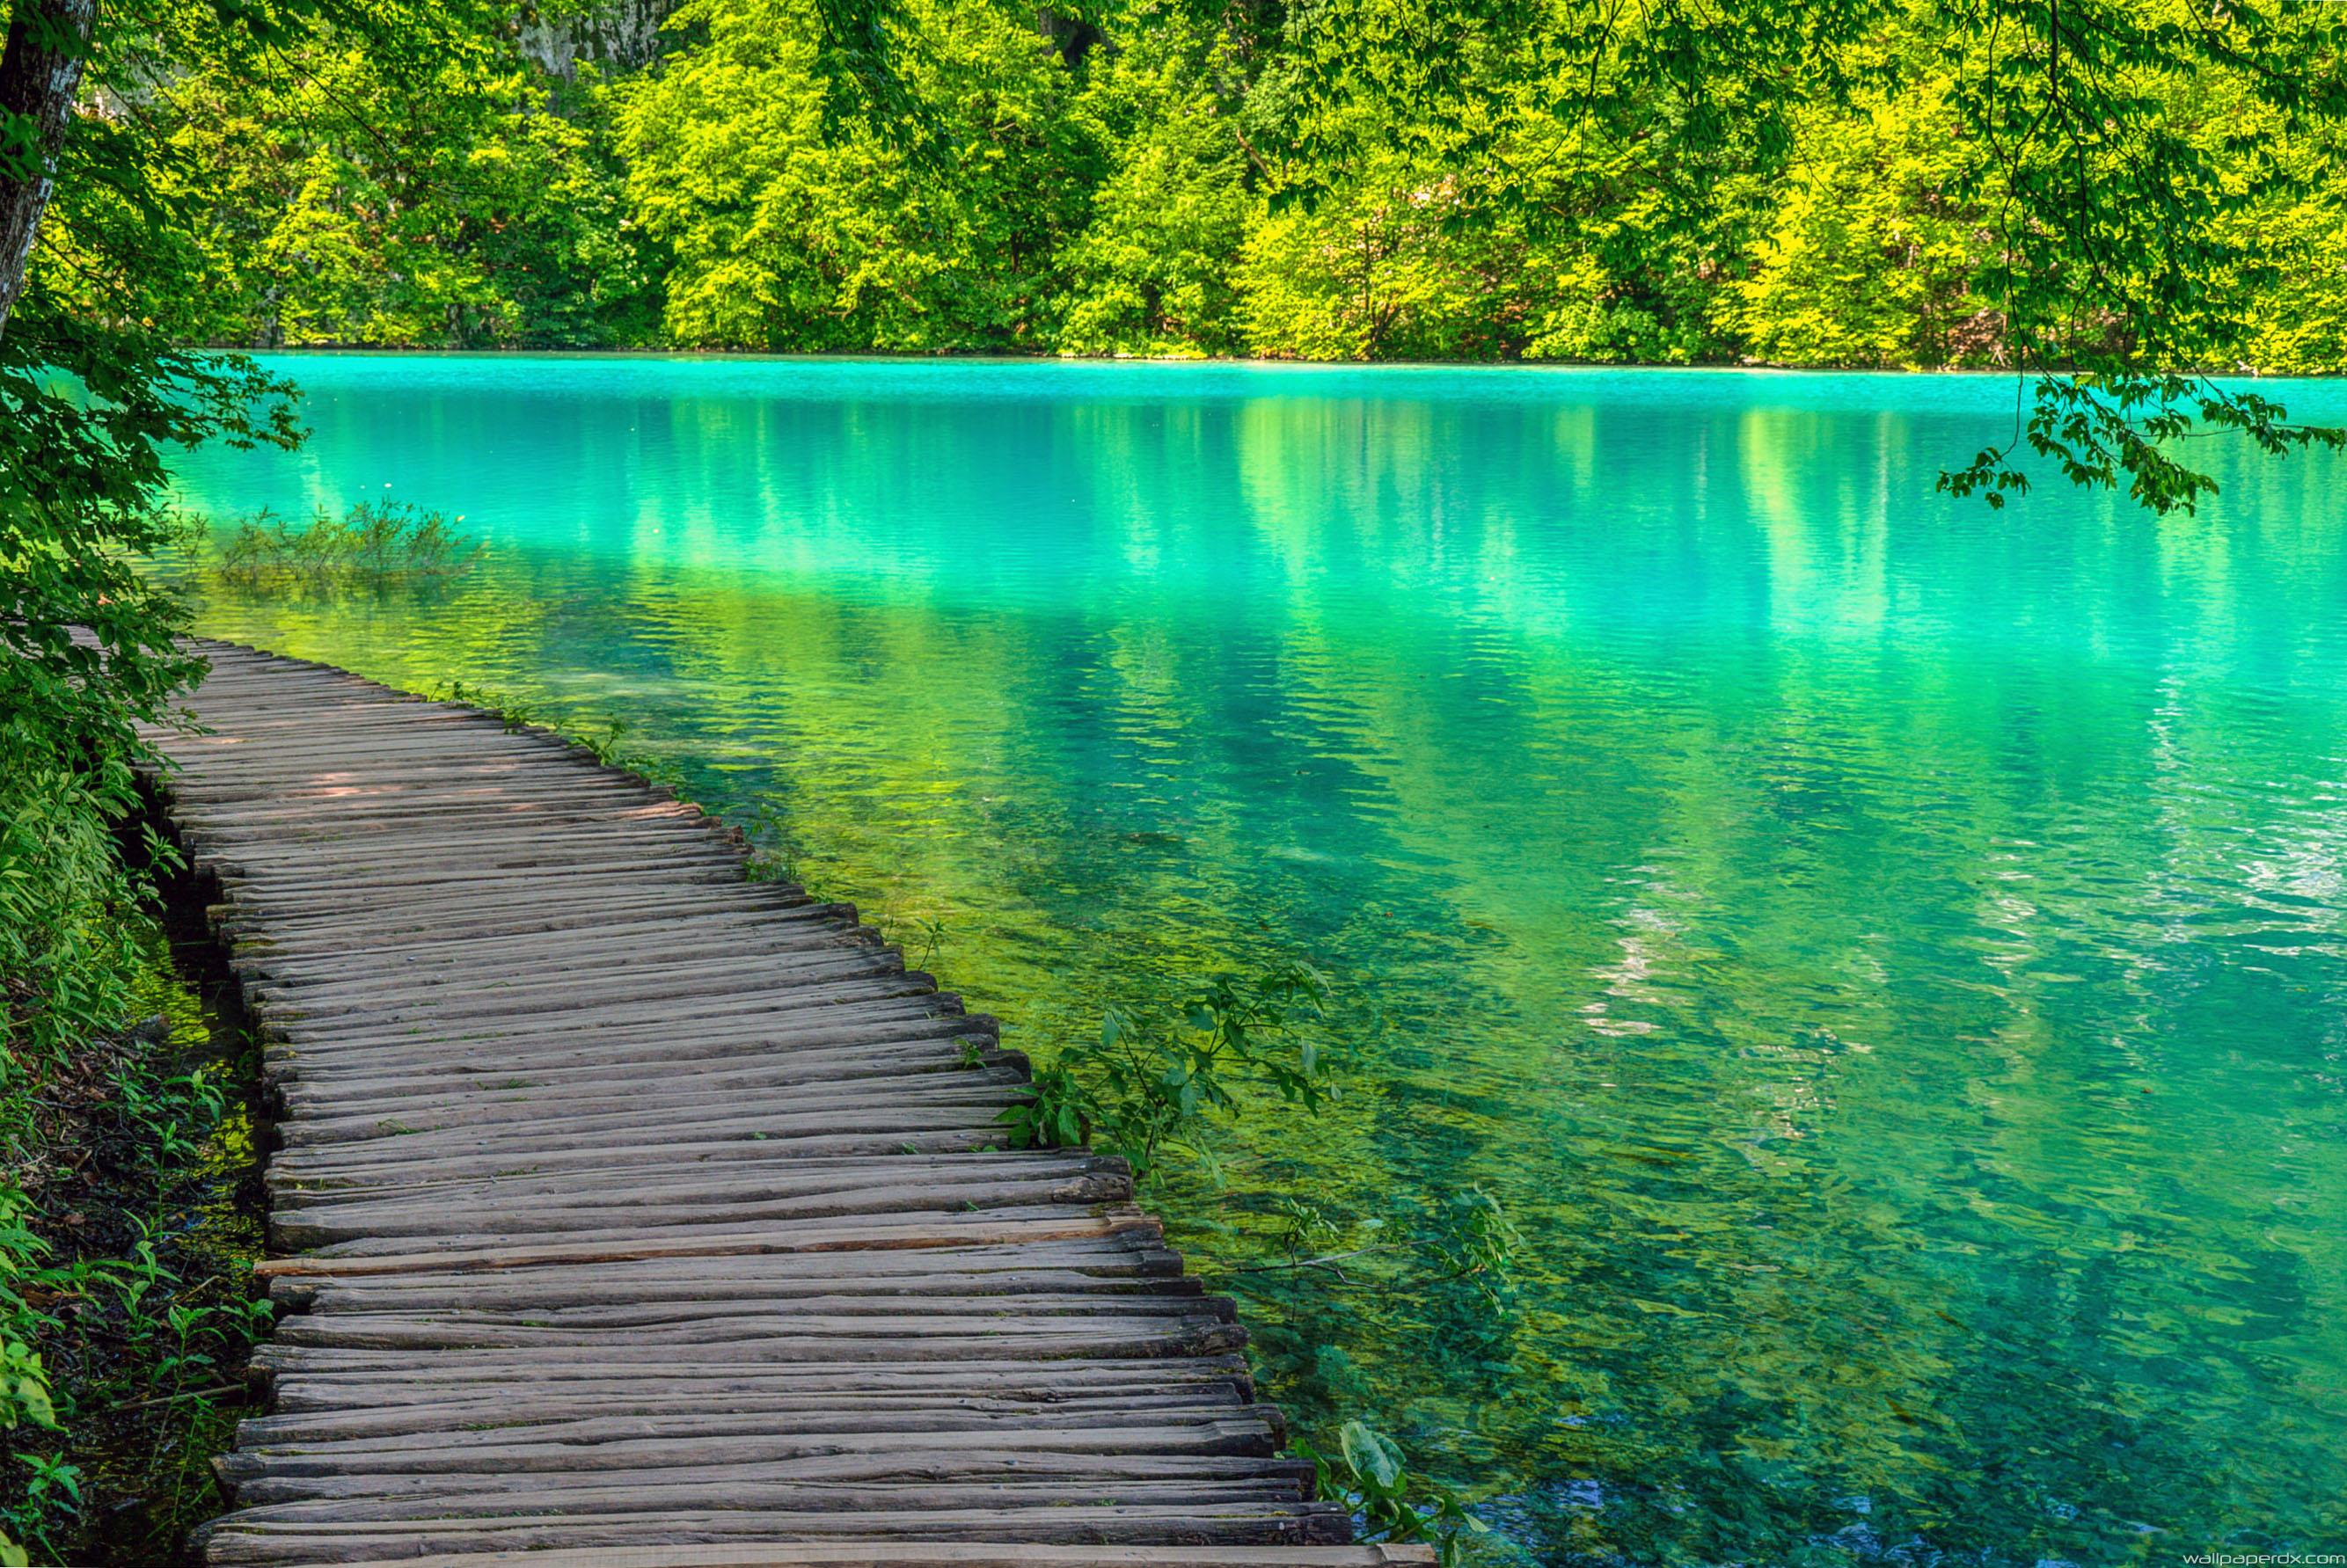 Download croatia plitvice lakes national park full hd wallpaper 2668x1783 78 full hd - Plitvice lakes hd ...